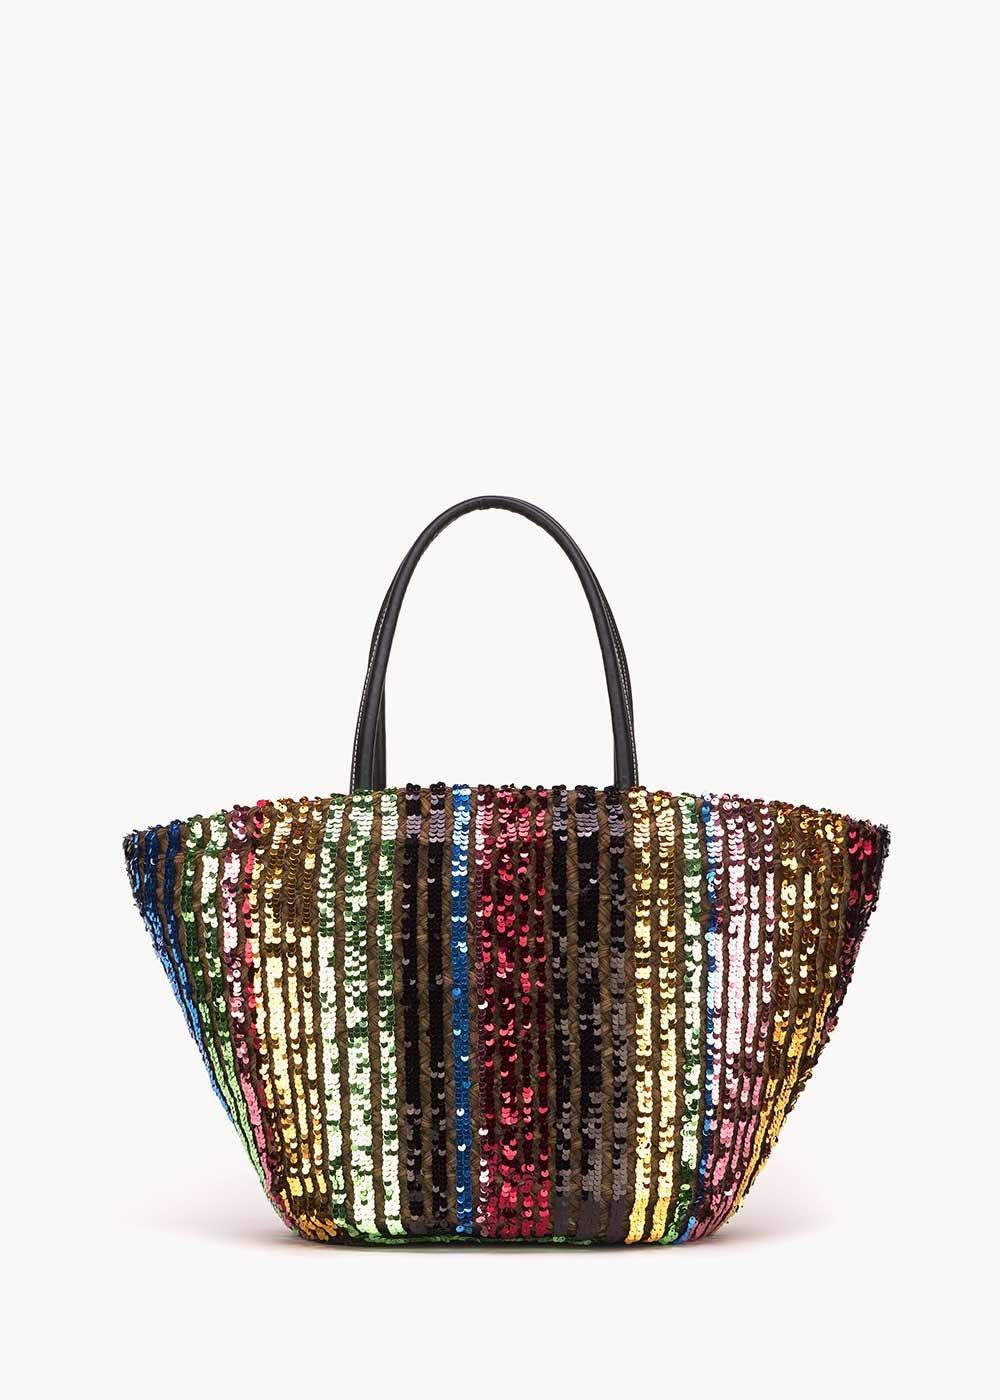 Baloon beach bag with multicolour sequins - Black / Stripes - Woman